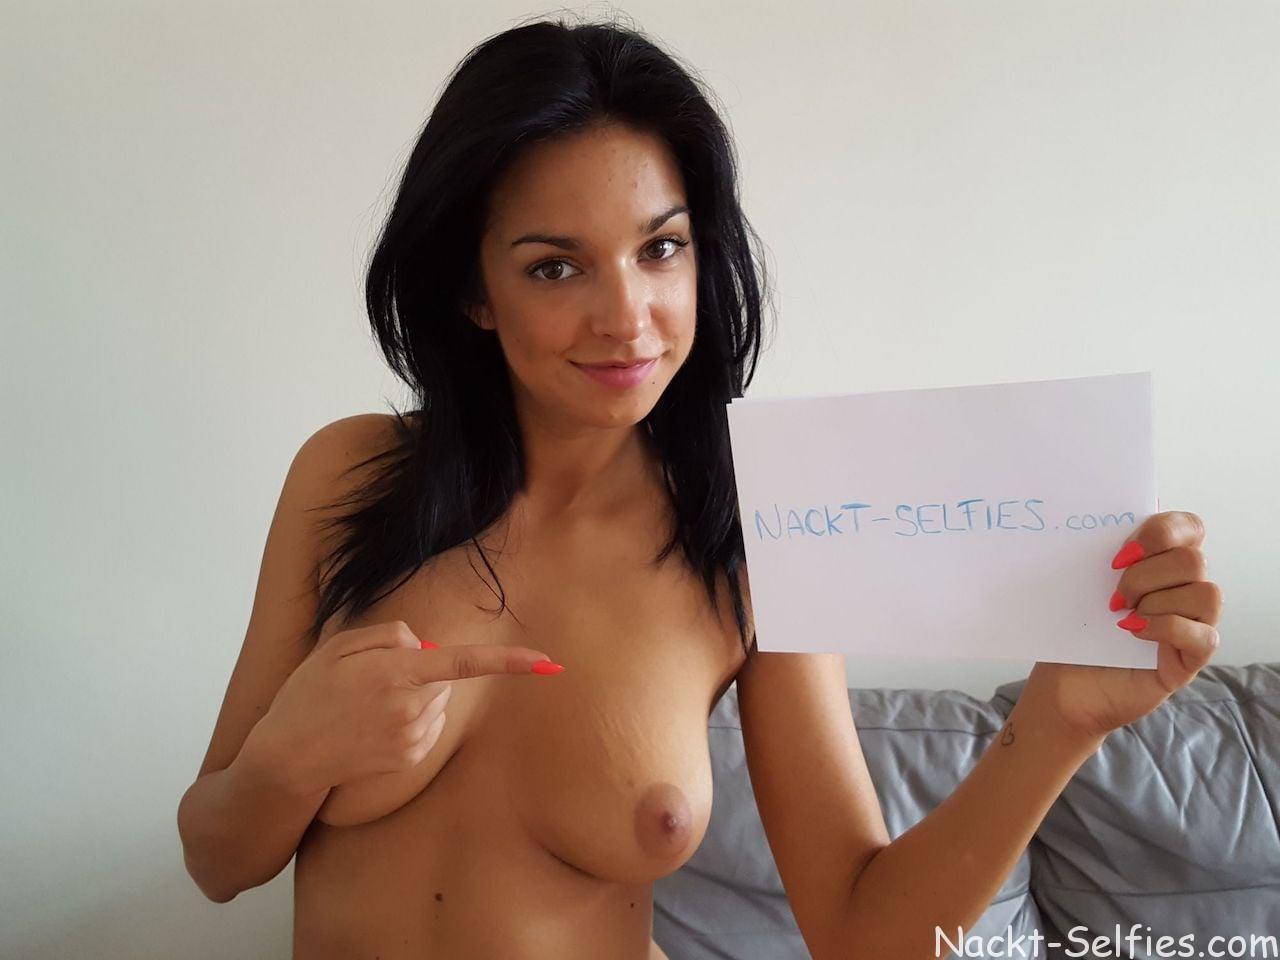 Amateur Nacktfotos Angelique